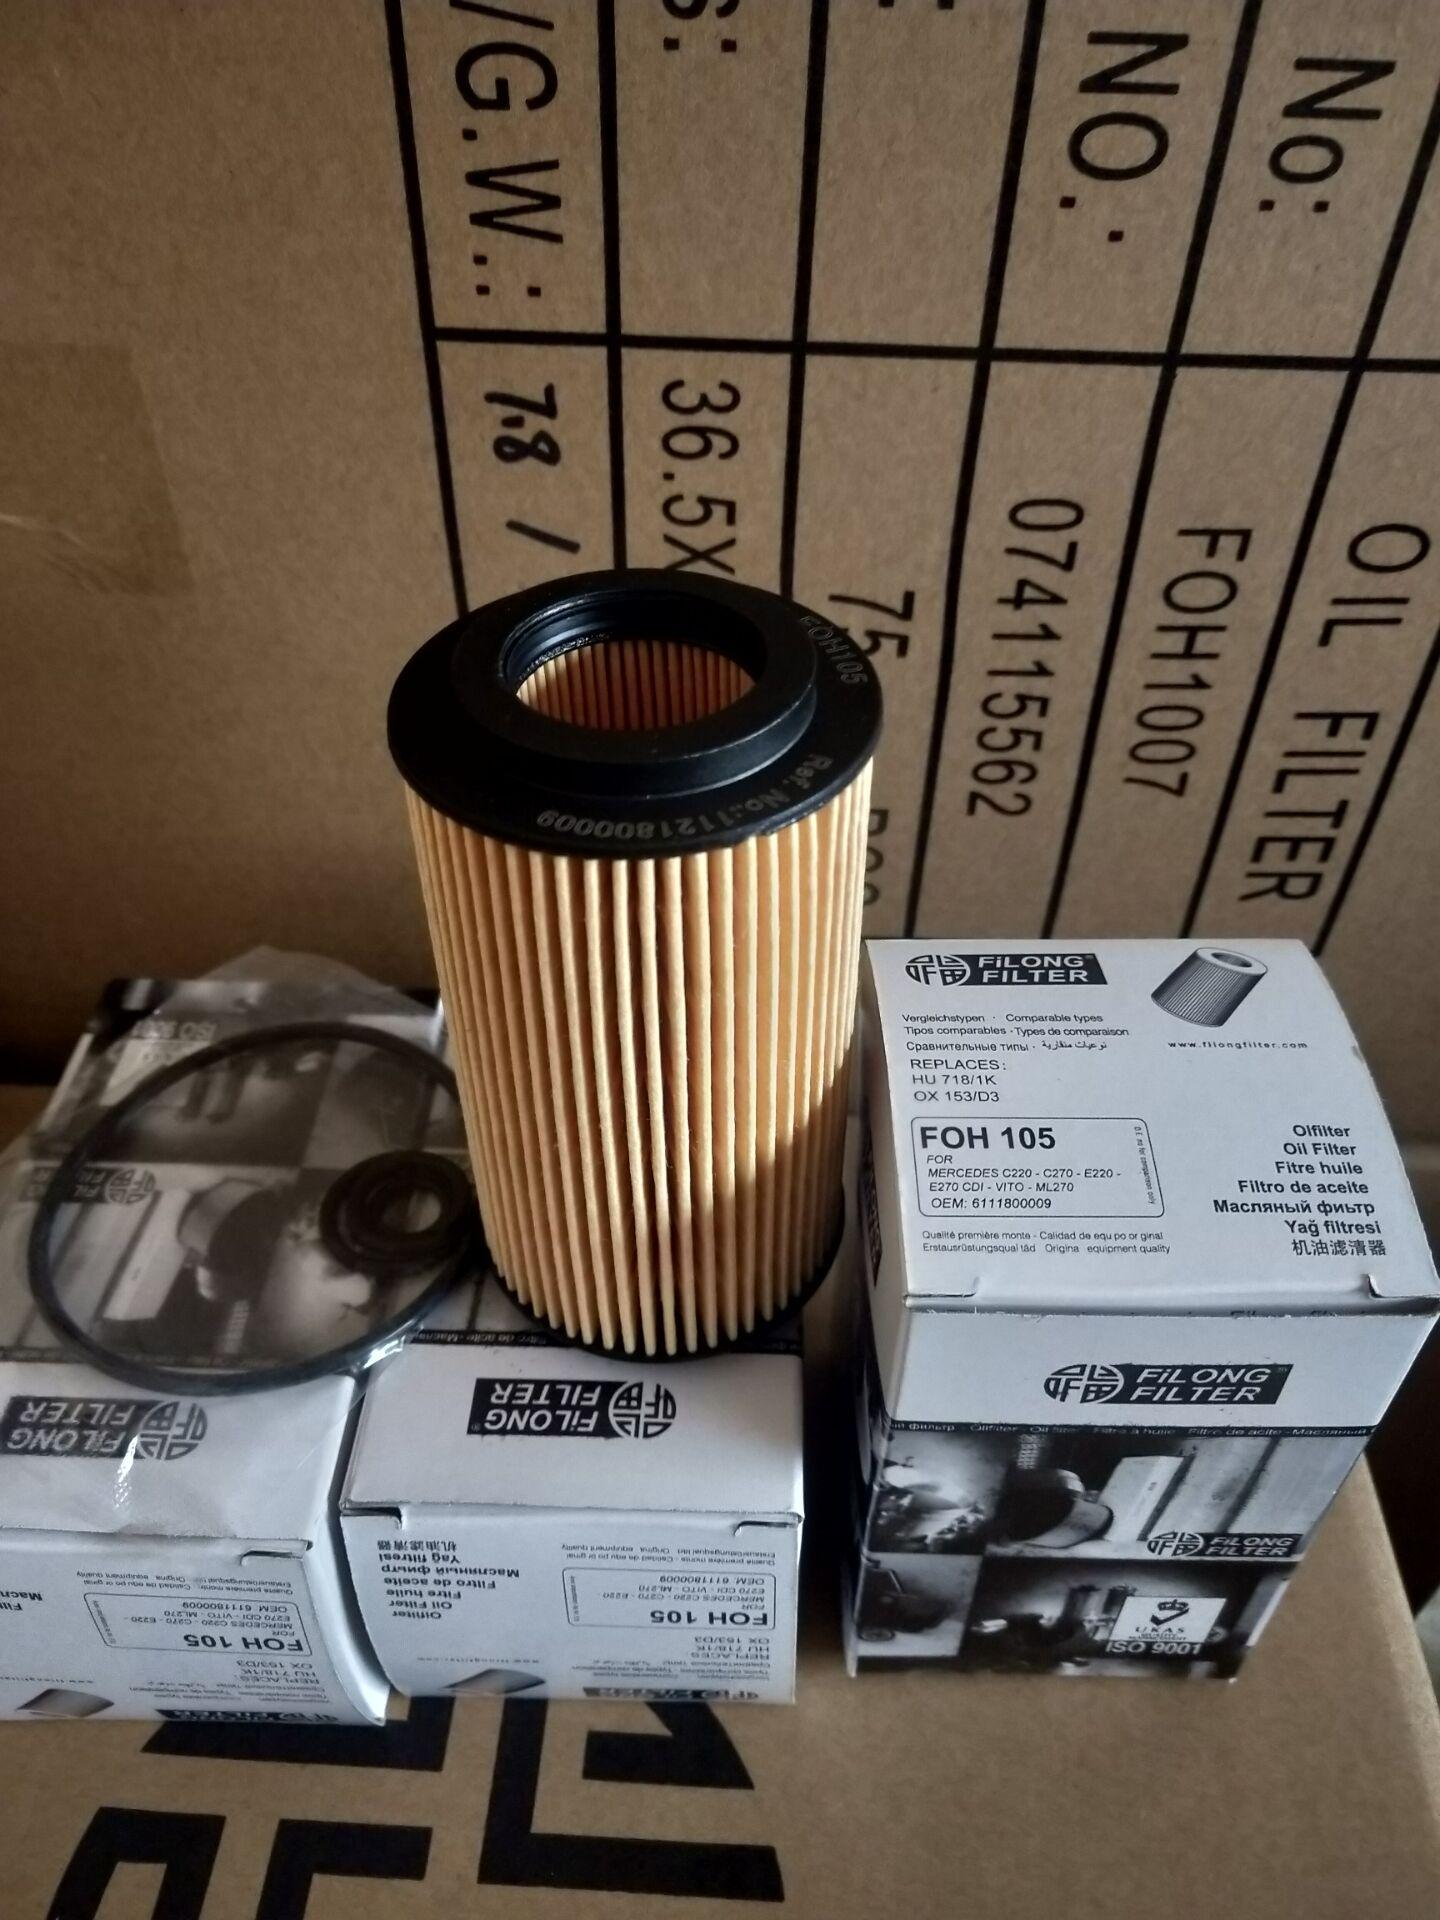 FOH-105,1121800009, HU718/1K,OX153/D3